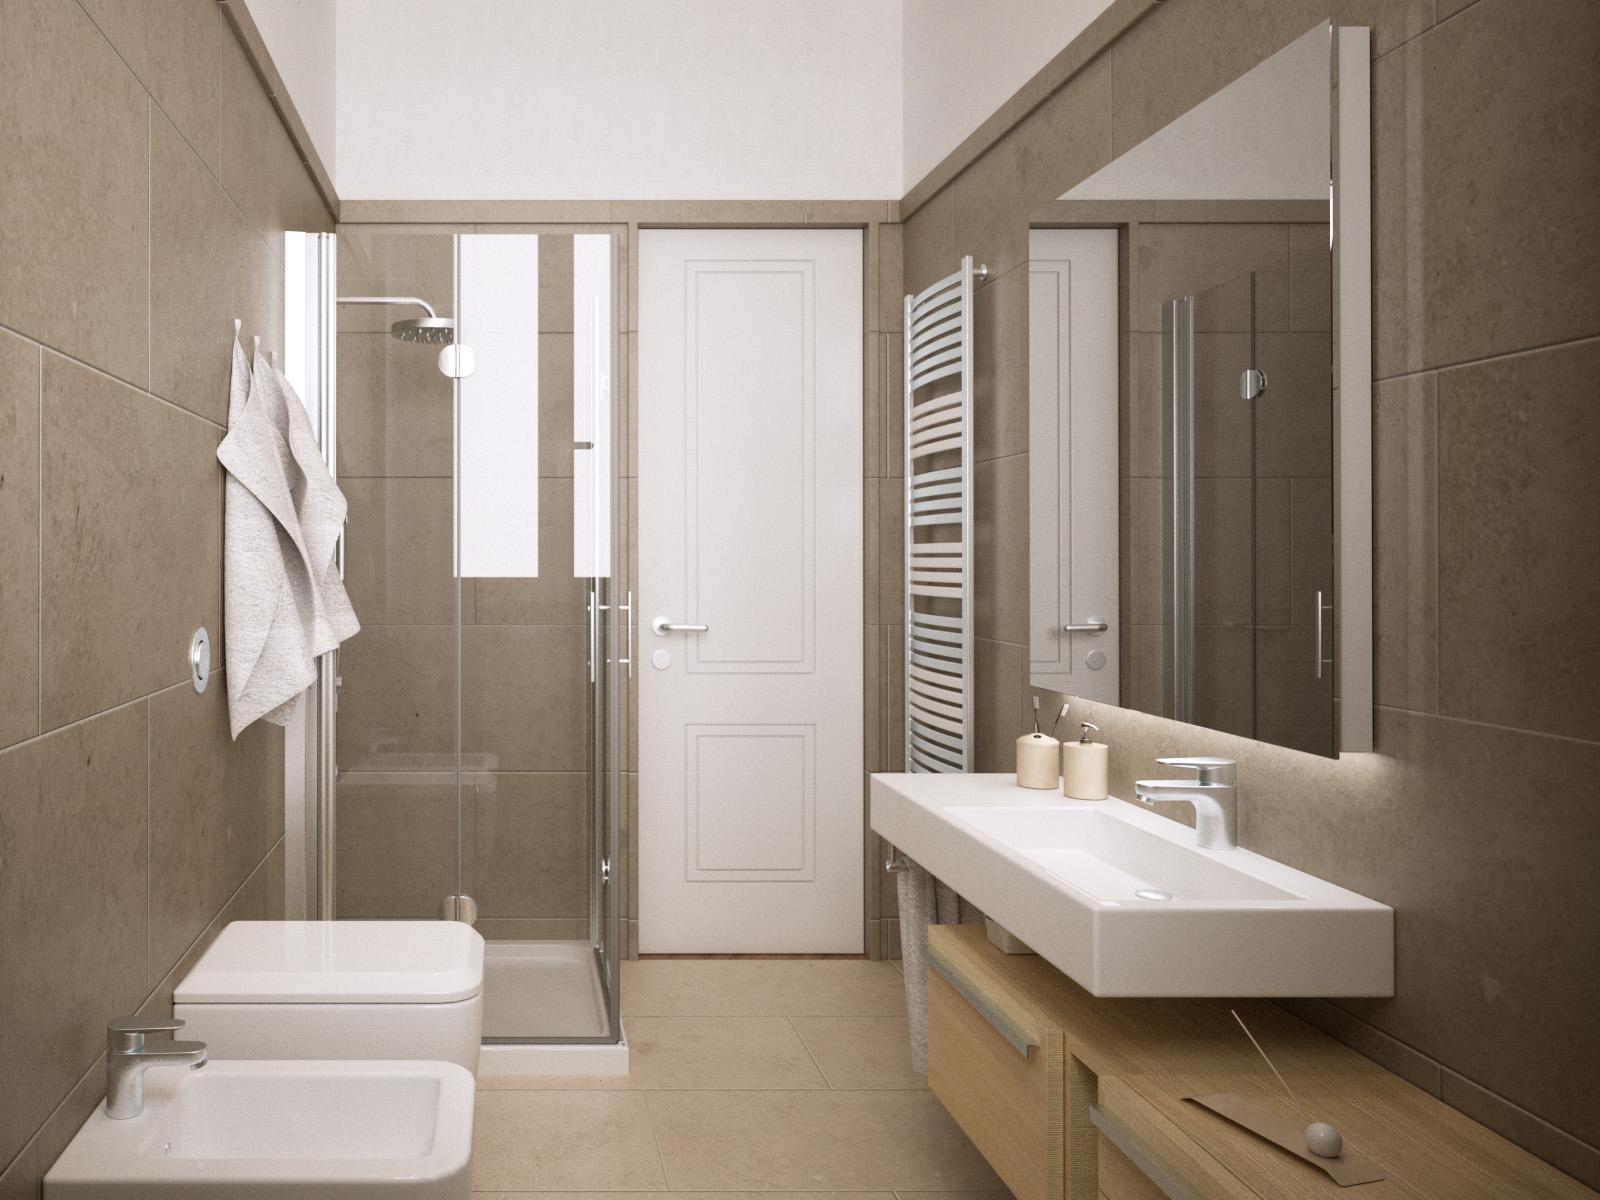 Immagini Bagno Moderno.3digit Bagno Moderno Minimale Gres Crema Rendering Firenze